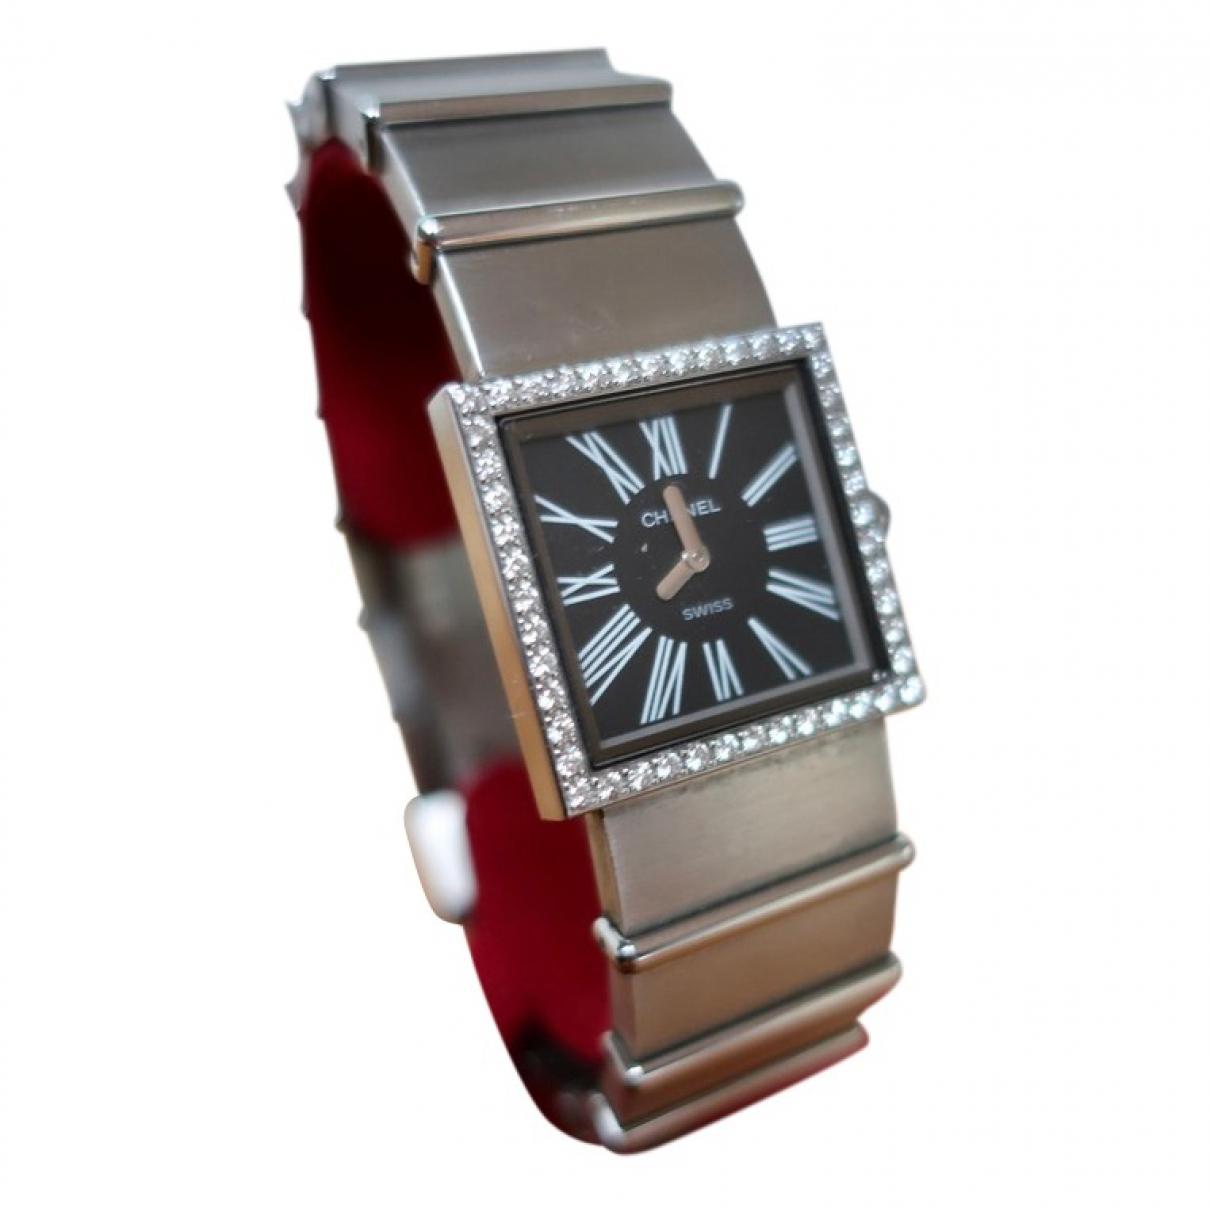 Reloj Mademoiselle Chanel